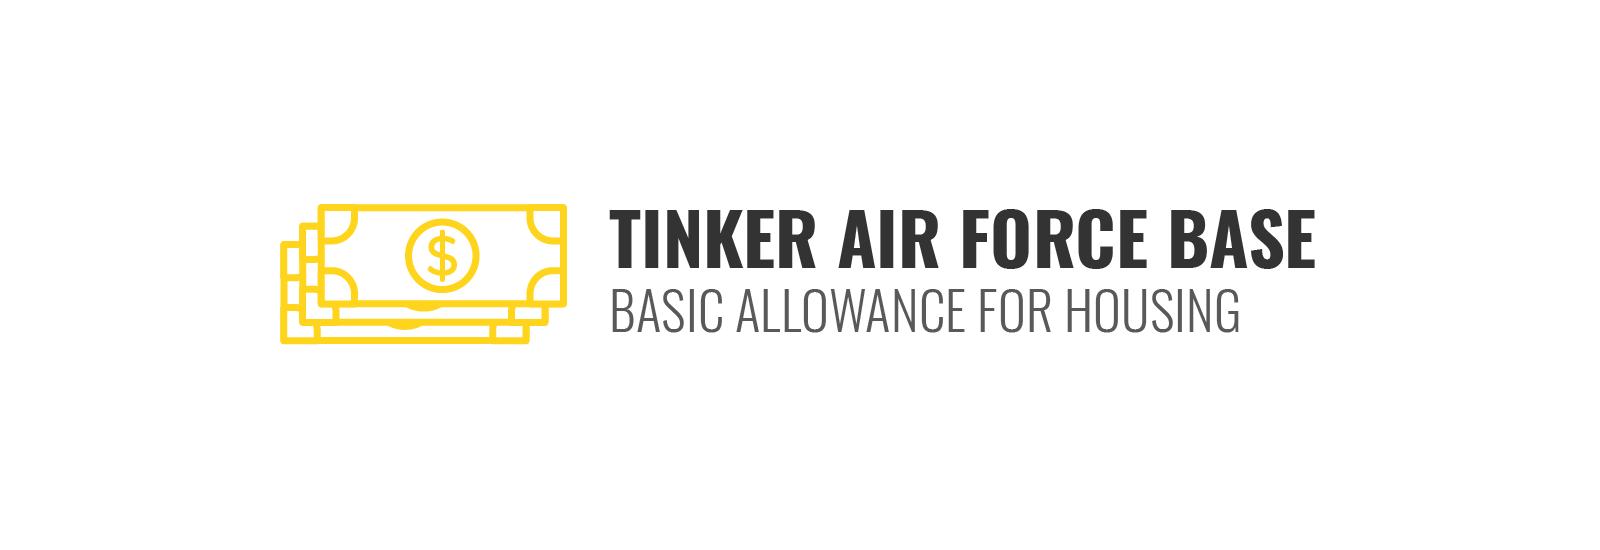 Tinker AFB BAH